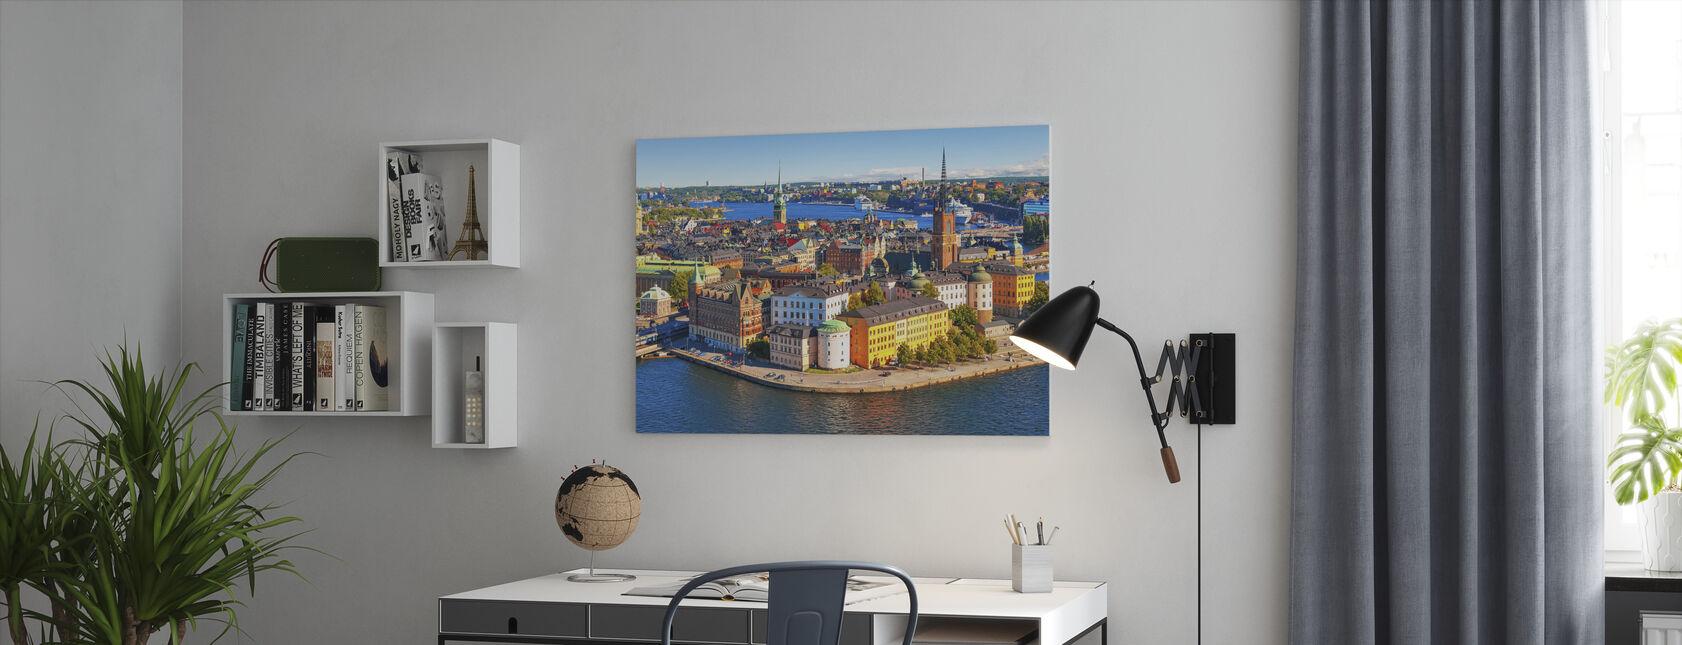 Panorama över Gamla stan i Stockholm - Canvastavla - Kontor